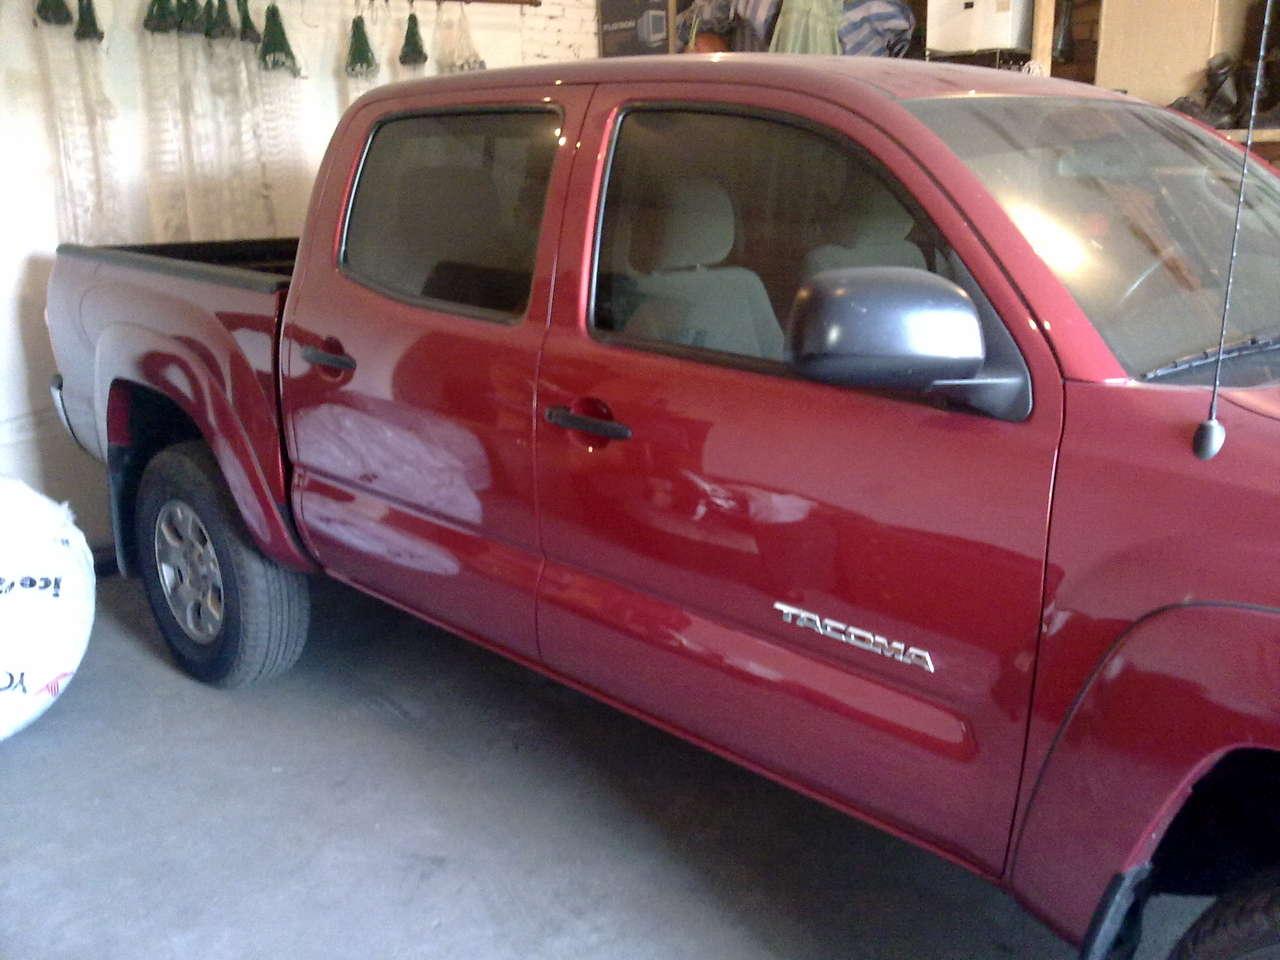 2005 toyota tacoma manual transmission problems